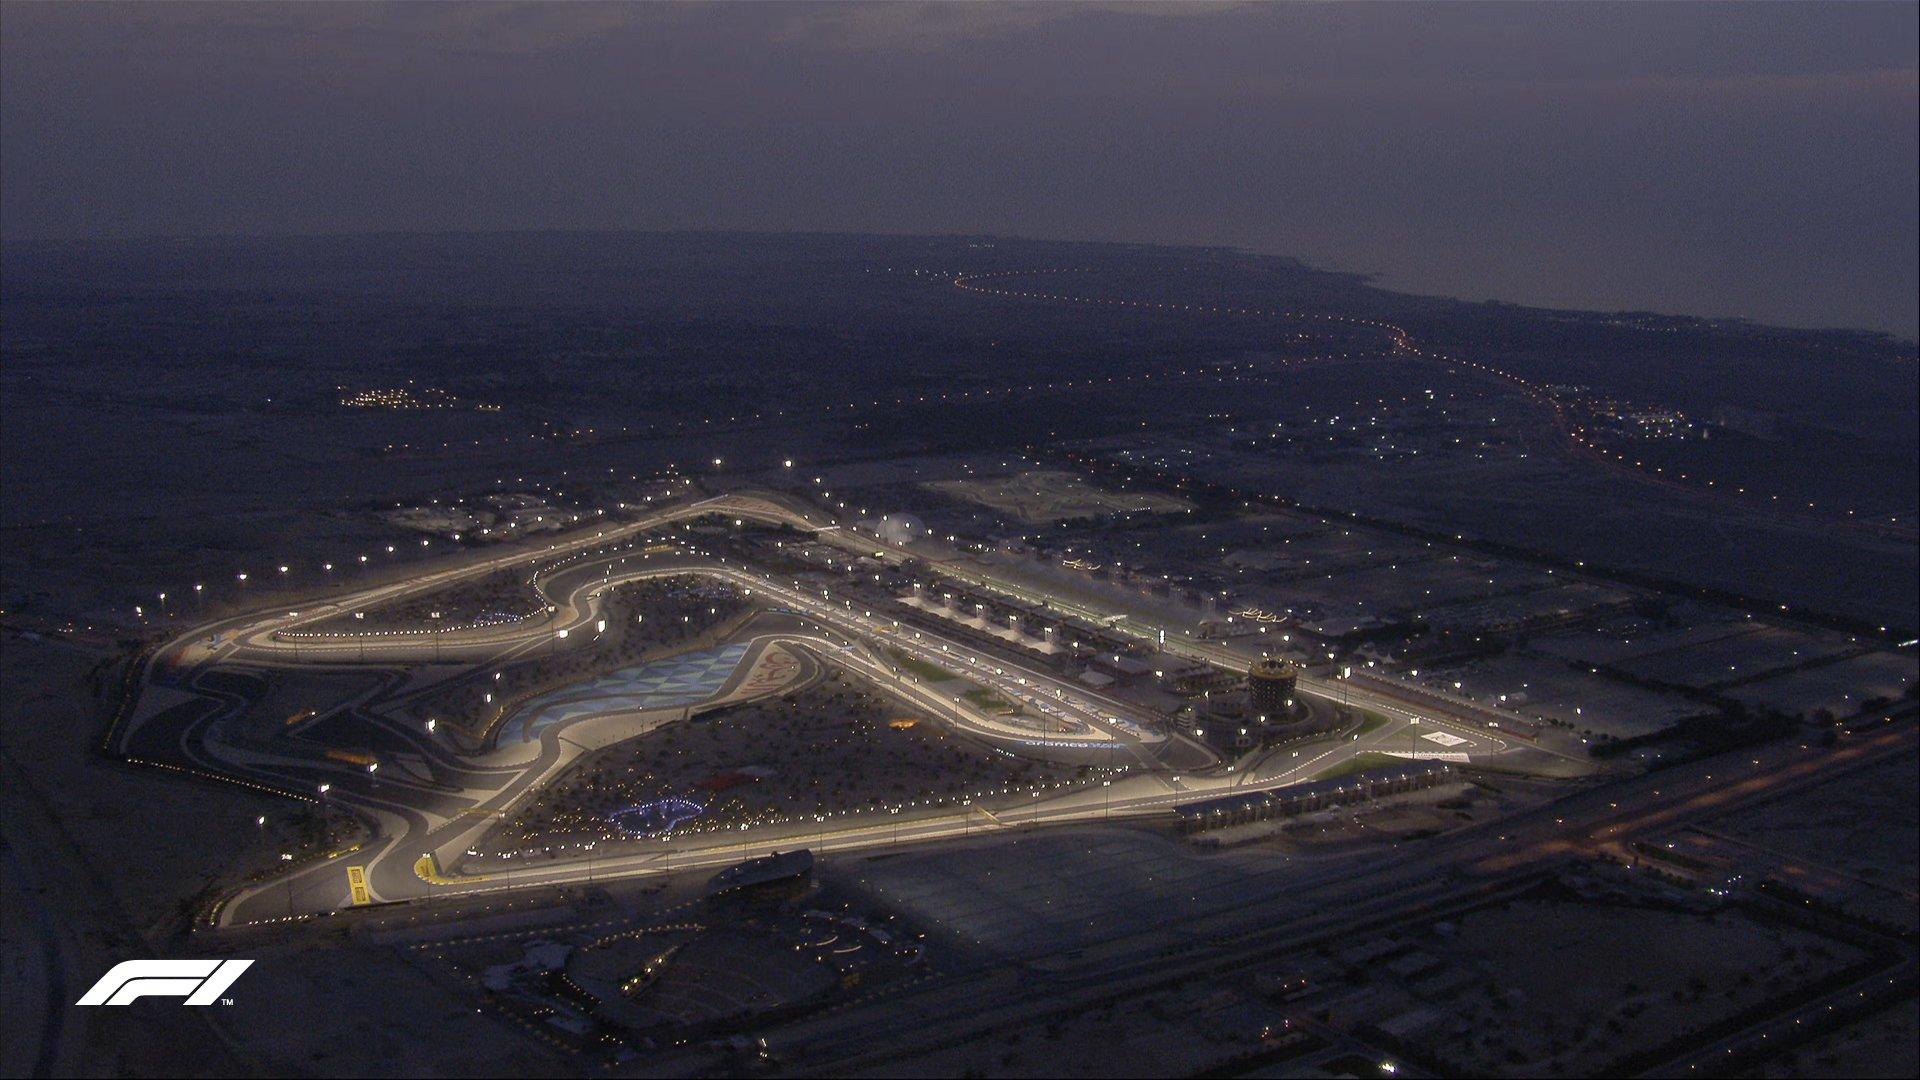 F1 Bahrain 2020, Gara - Diretta esclusiva ore 15:10 Sky Sport, Differita TV8